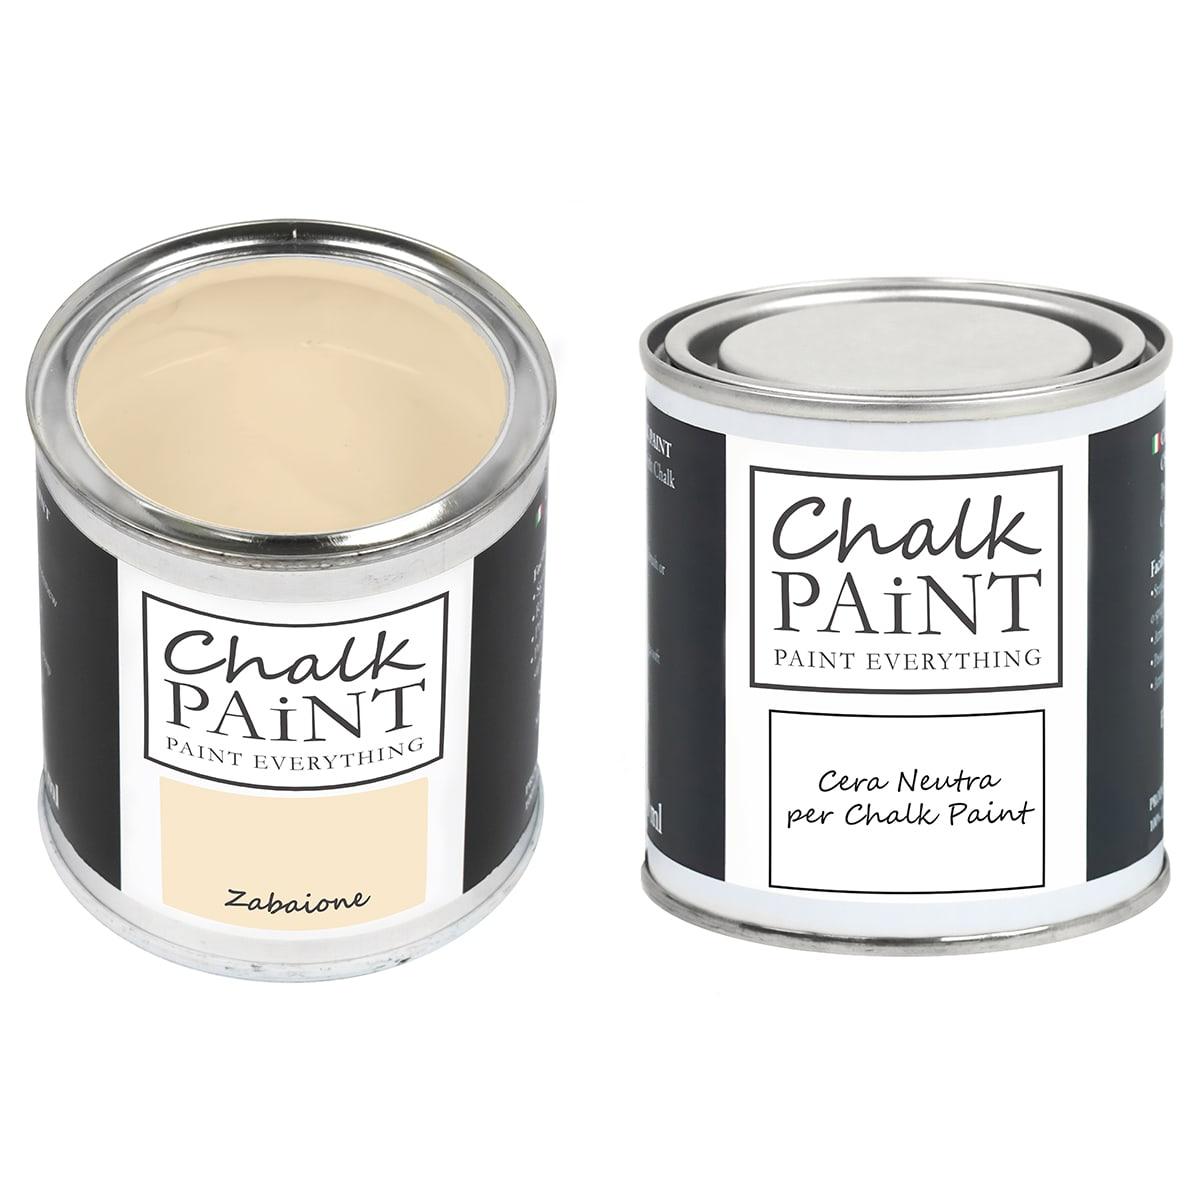 Chalk Paint Zabaione + Cera Shabby